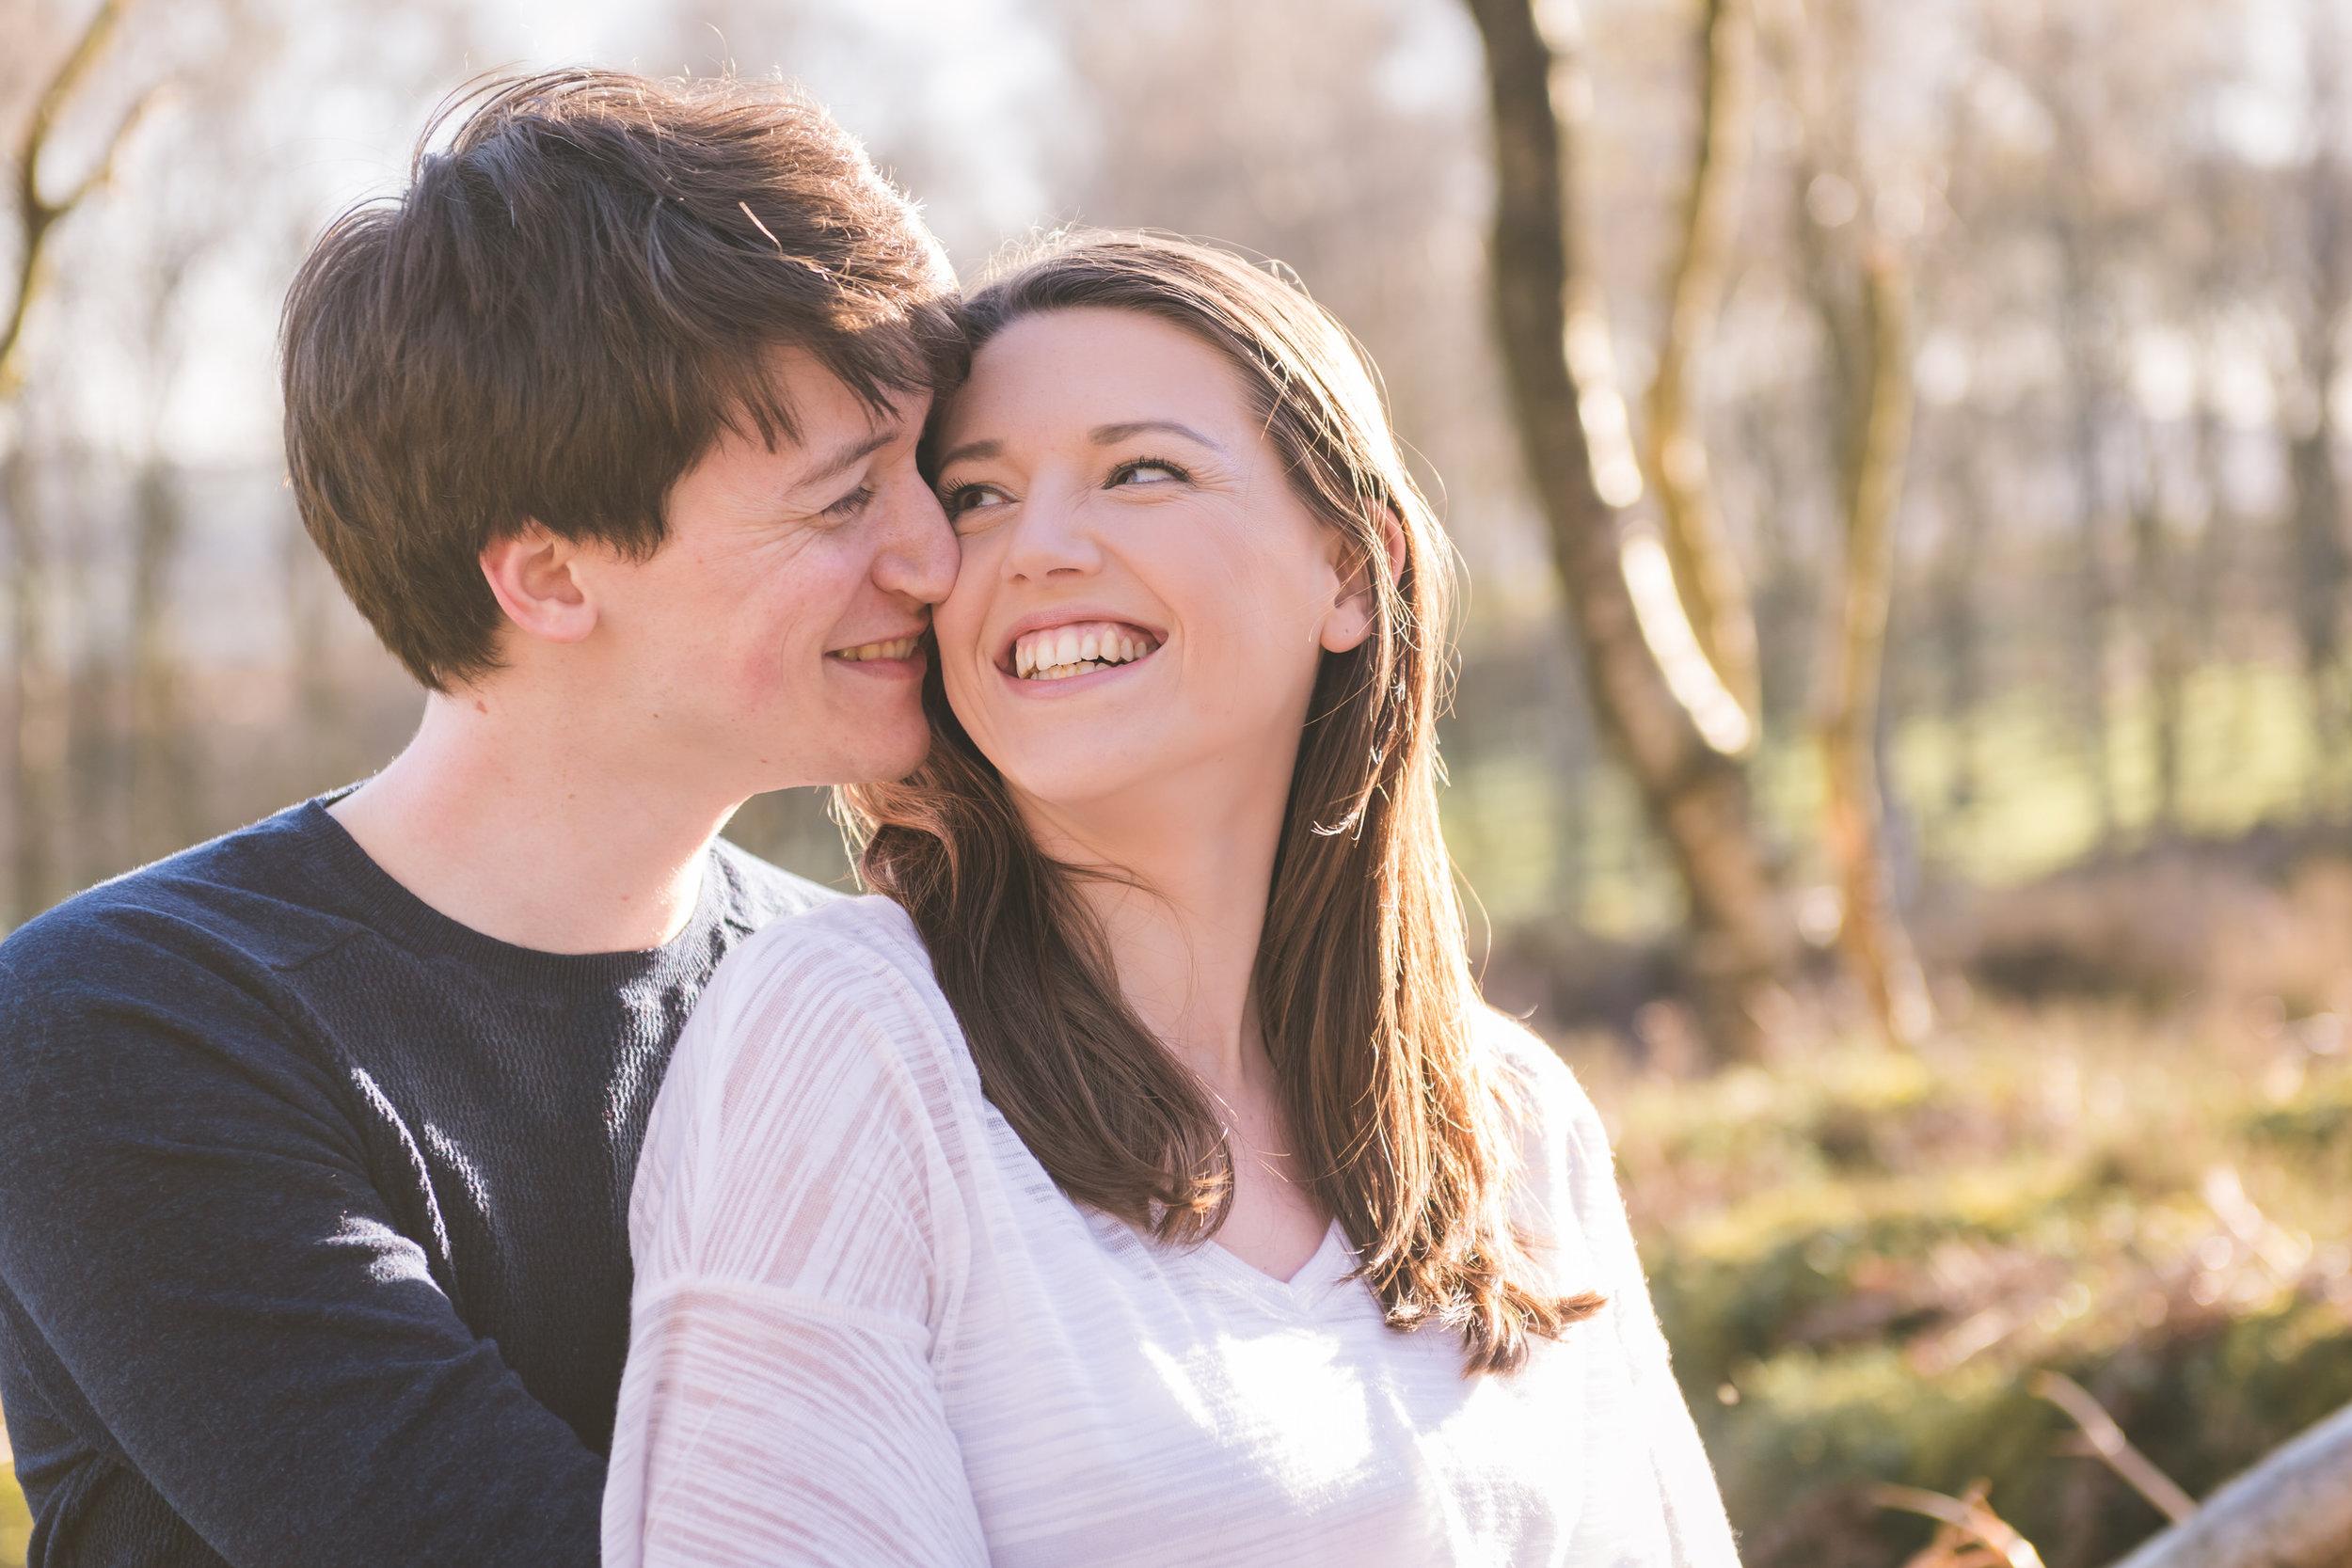 leeds-wedding-photographer-pennines-engagement-8.jpg